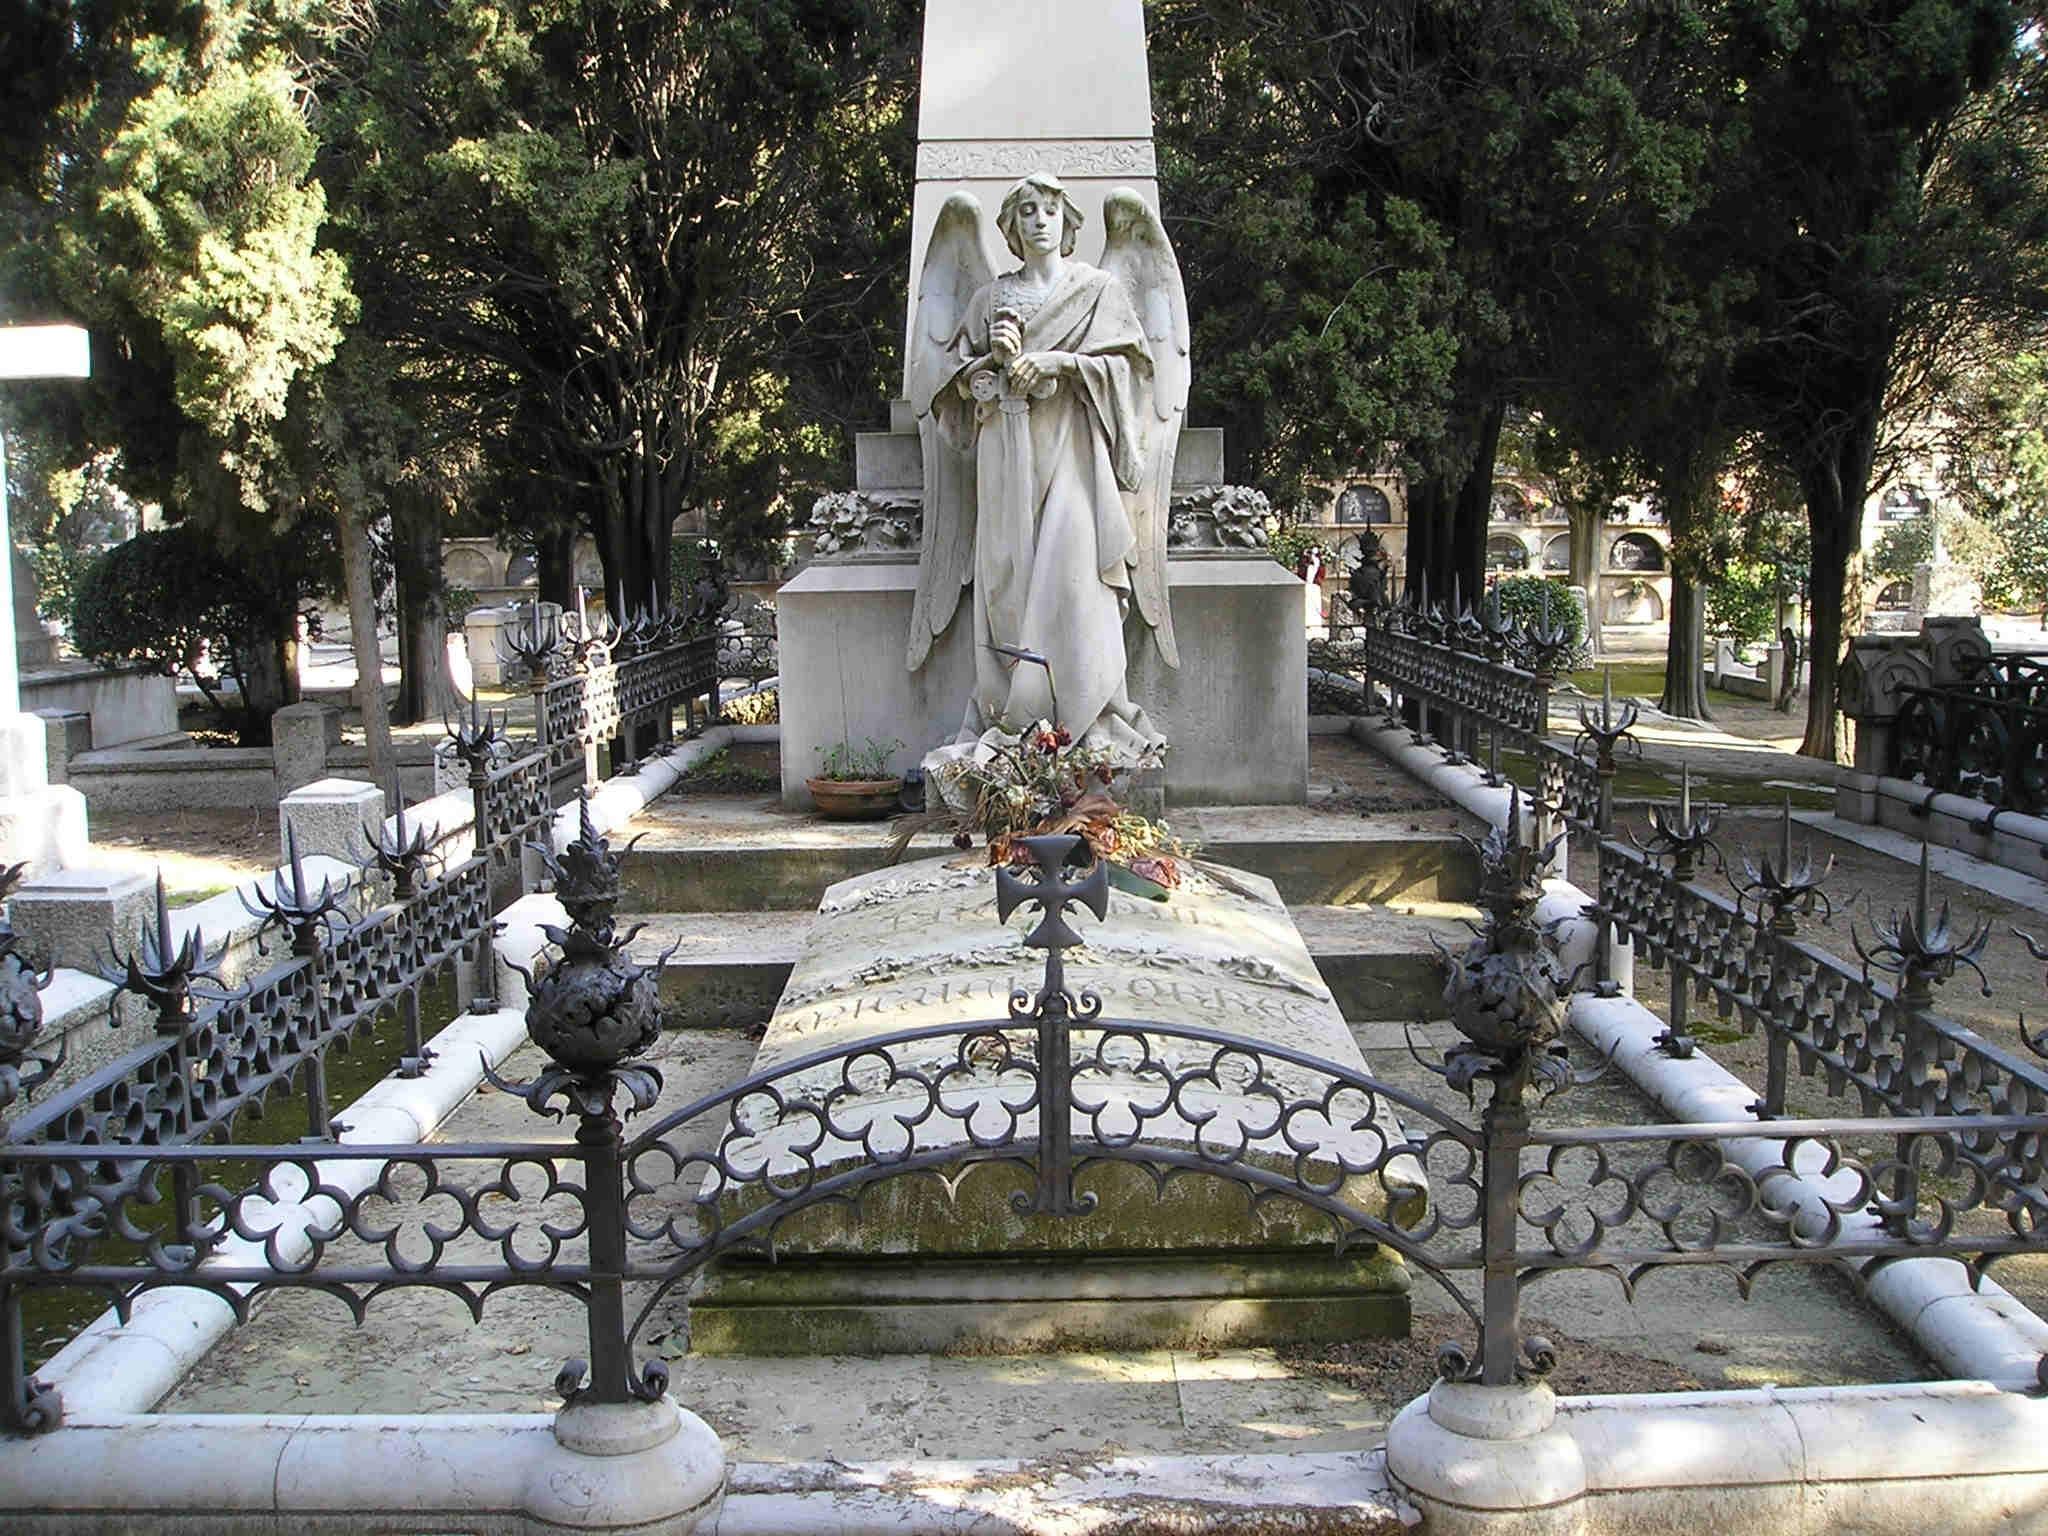 Cemetery Vilafranca del Penedès (Vilafranca del Penedès, Spain)